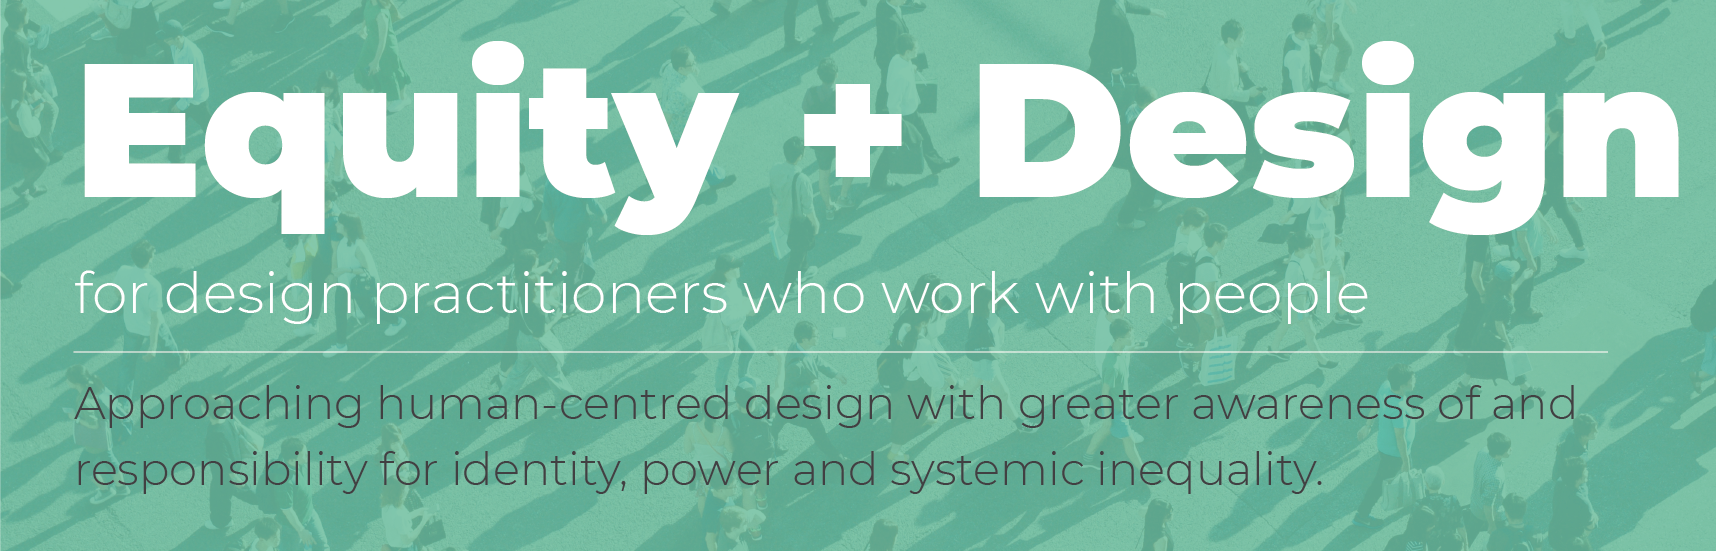 Equity Design Banner.png